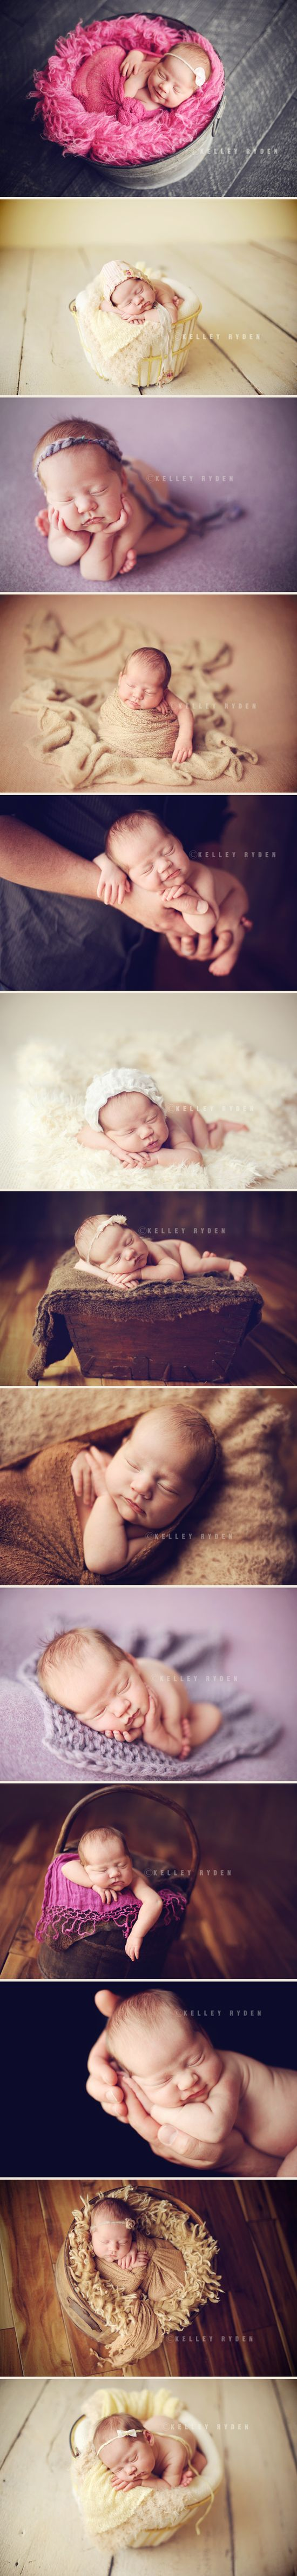 newborn styling and posing